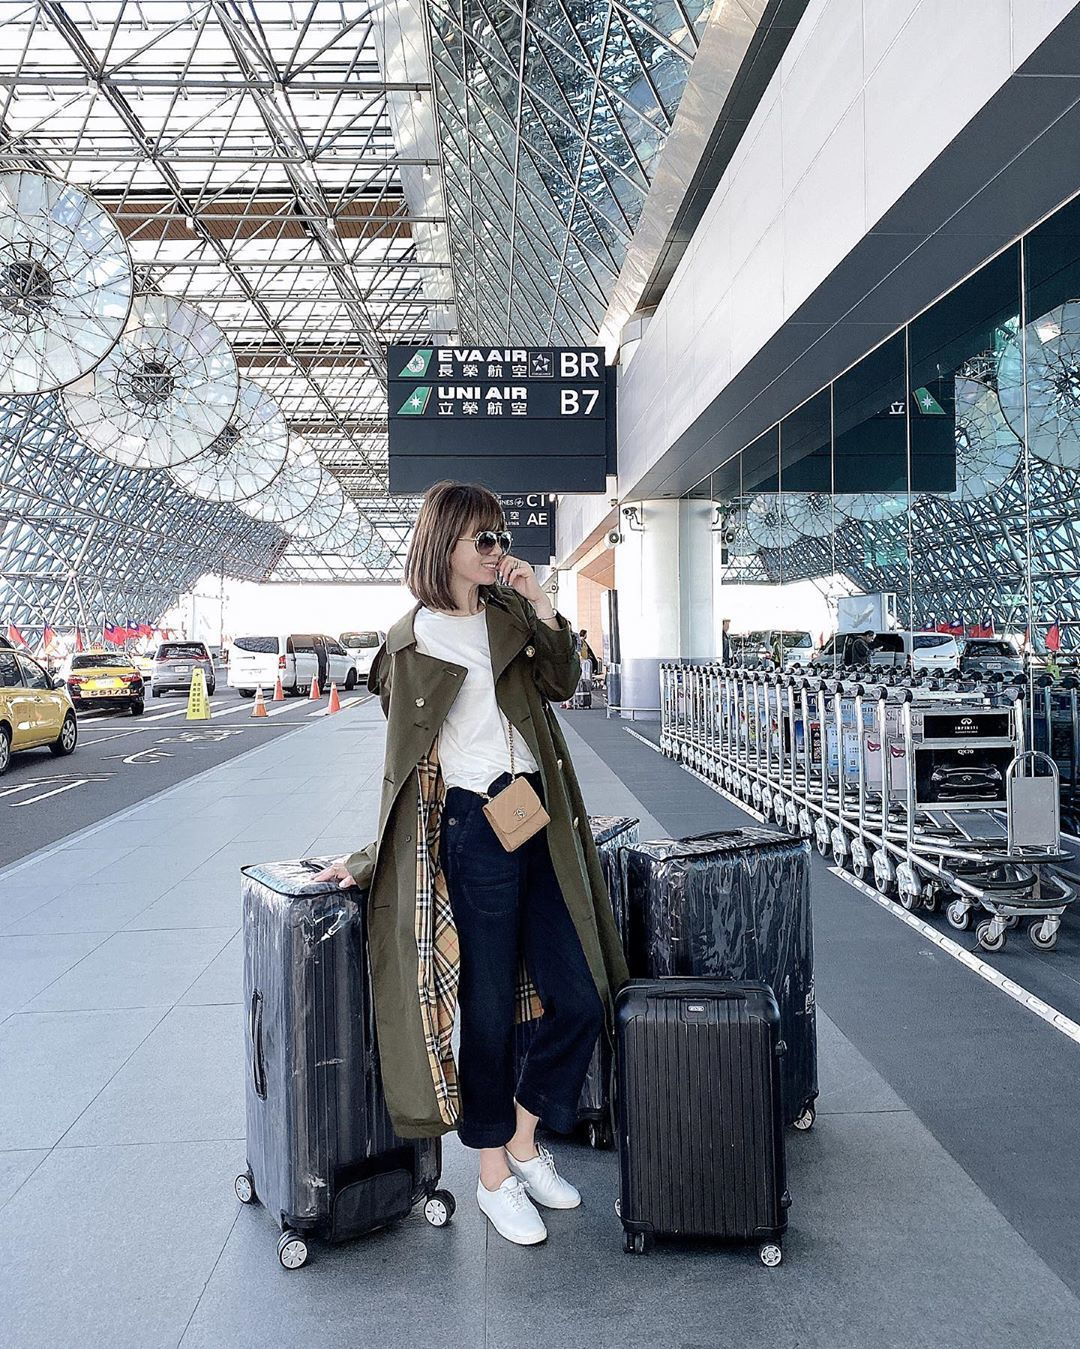 Melody身穿經典長版風衣系列前往倫敦出差 ,售價79,000元。圖/取自IG